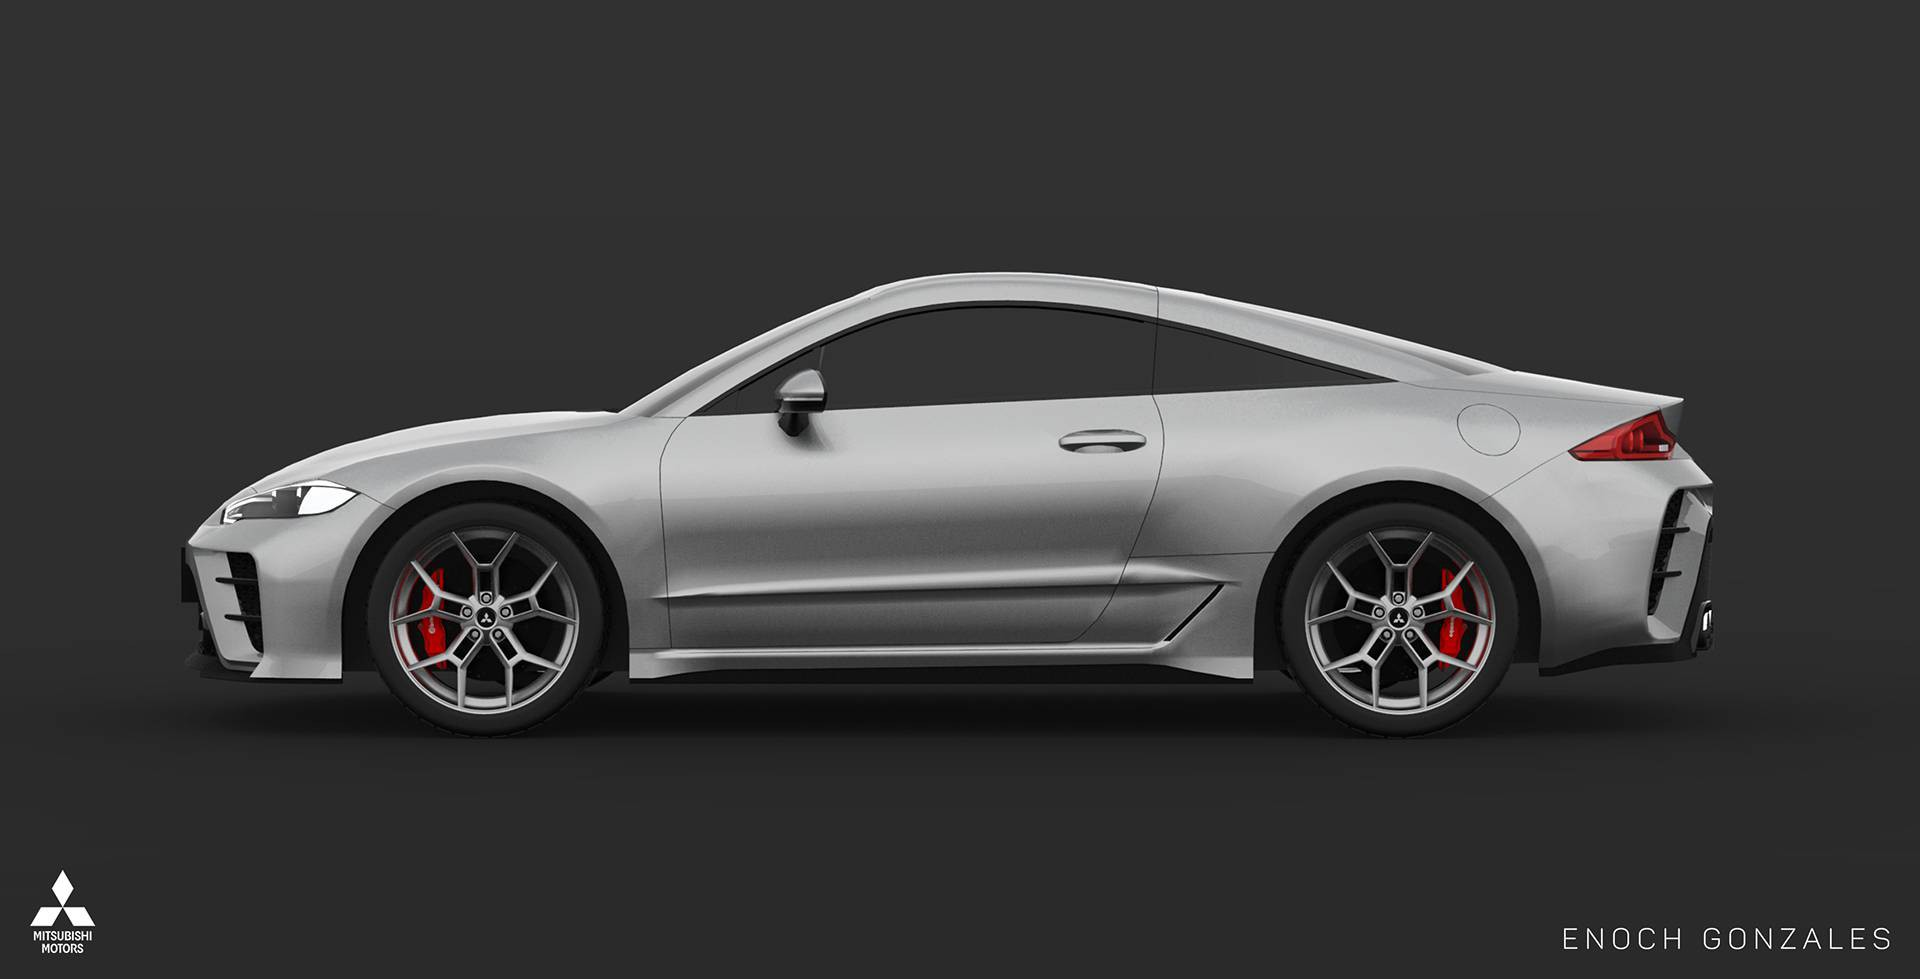 https://cdn.drivemag.net/media/default/0001/77/Next-generation-Mitsubishi-Eclipse-renderings-2-6927.jpeg